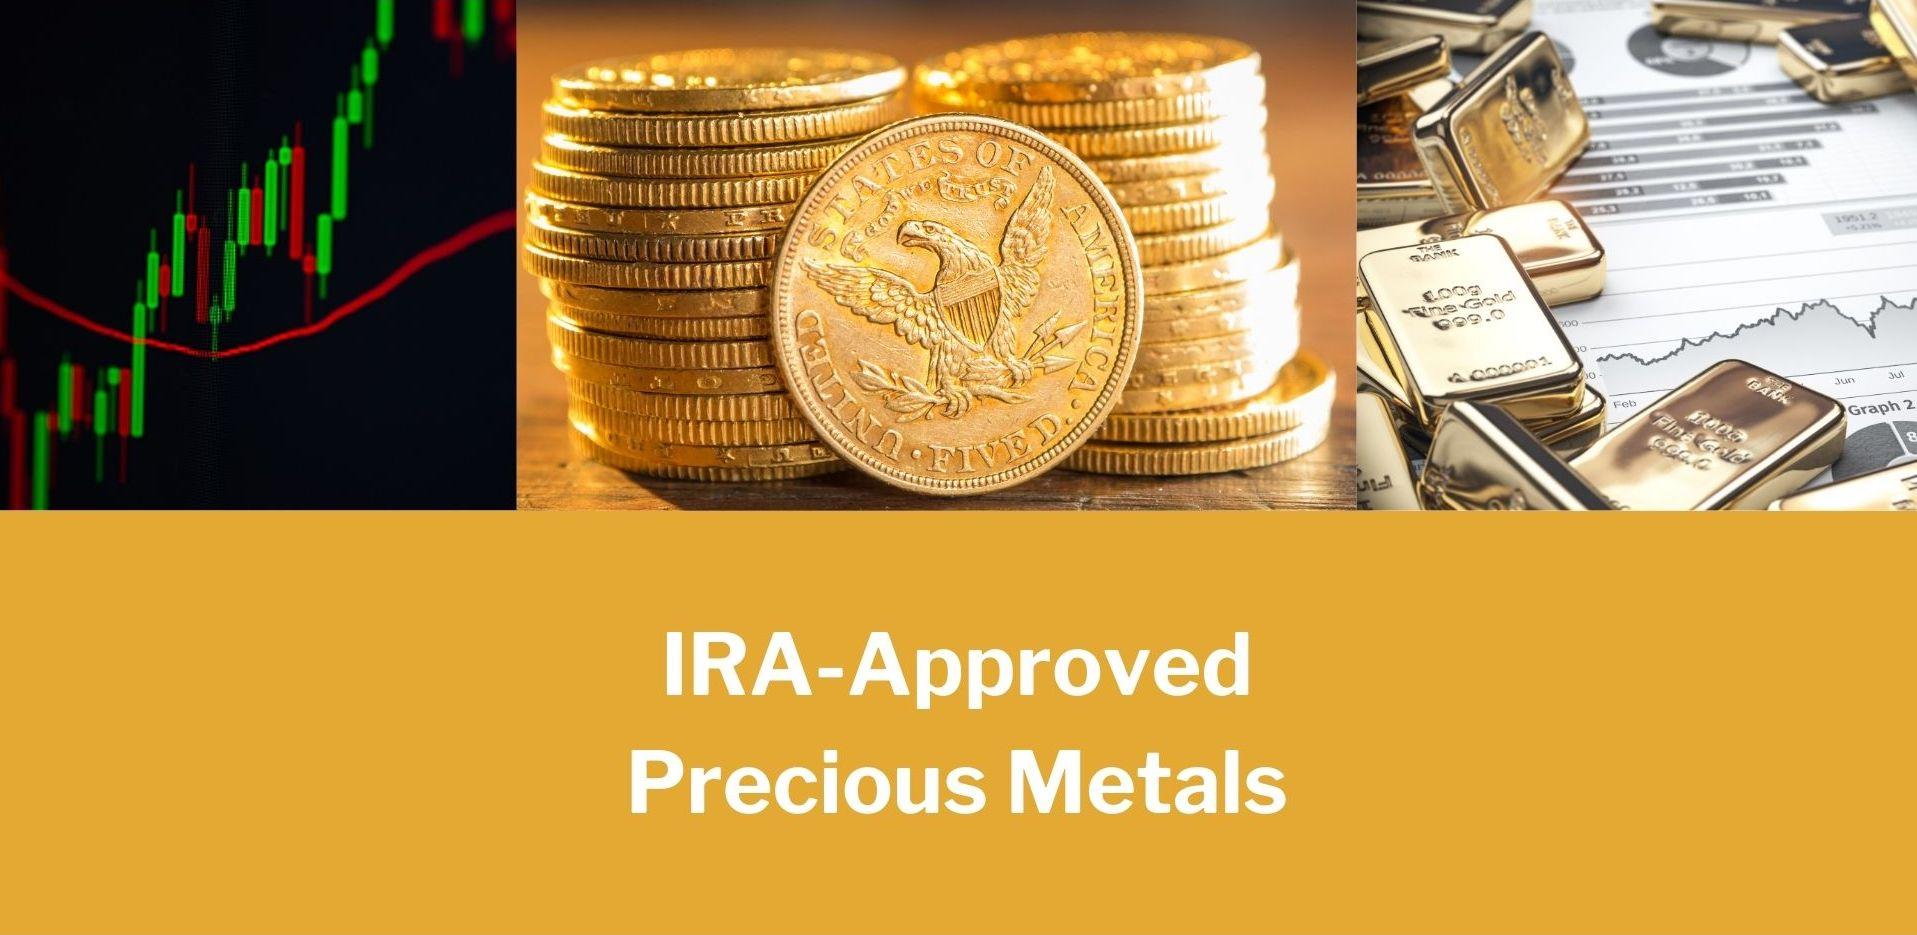 IRA approved precious metals hero image